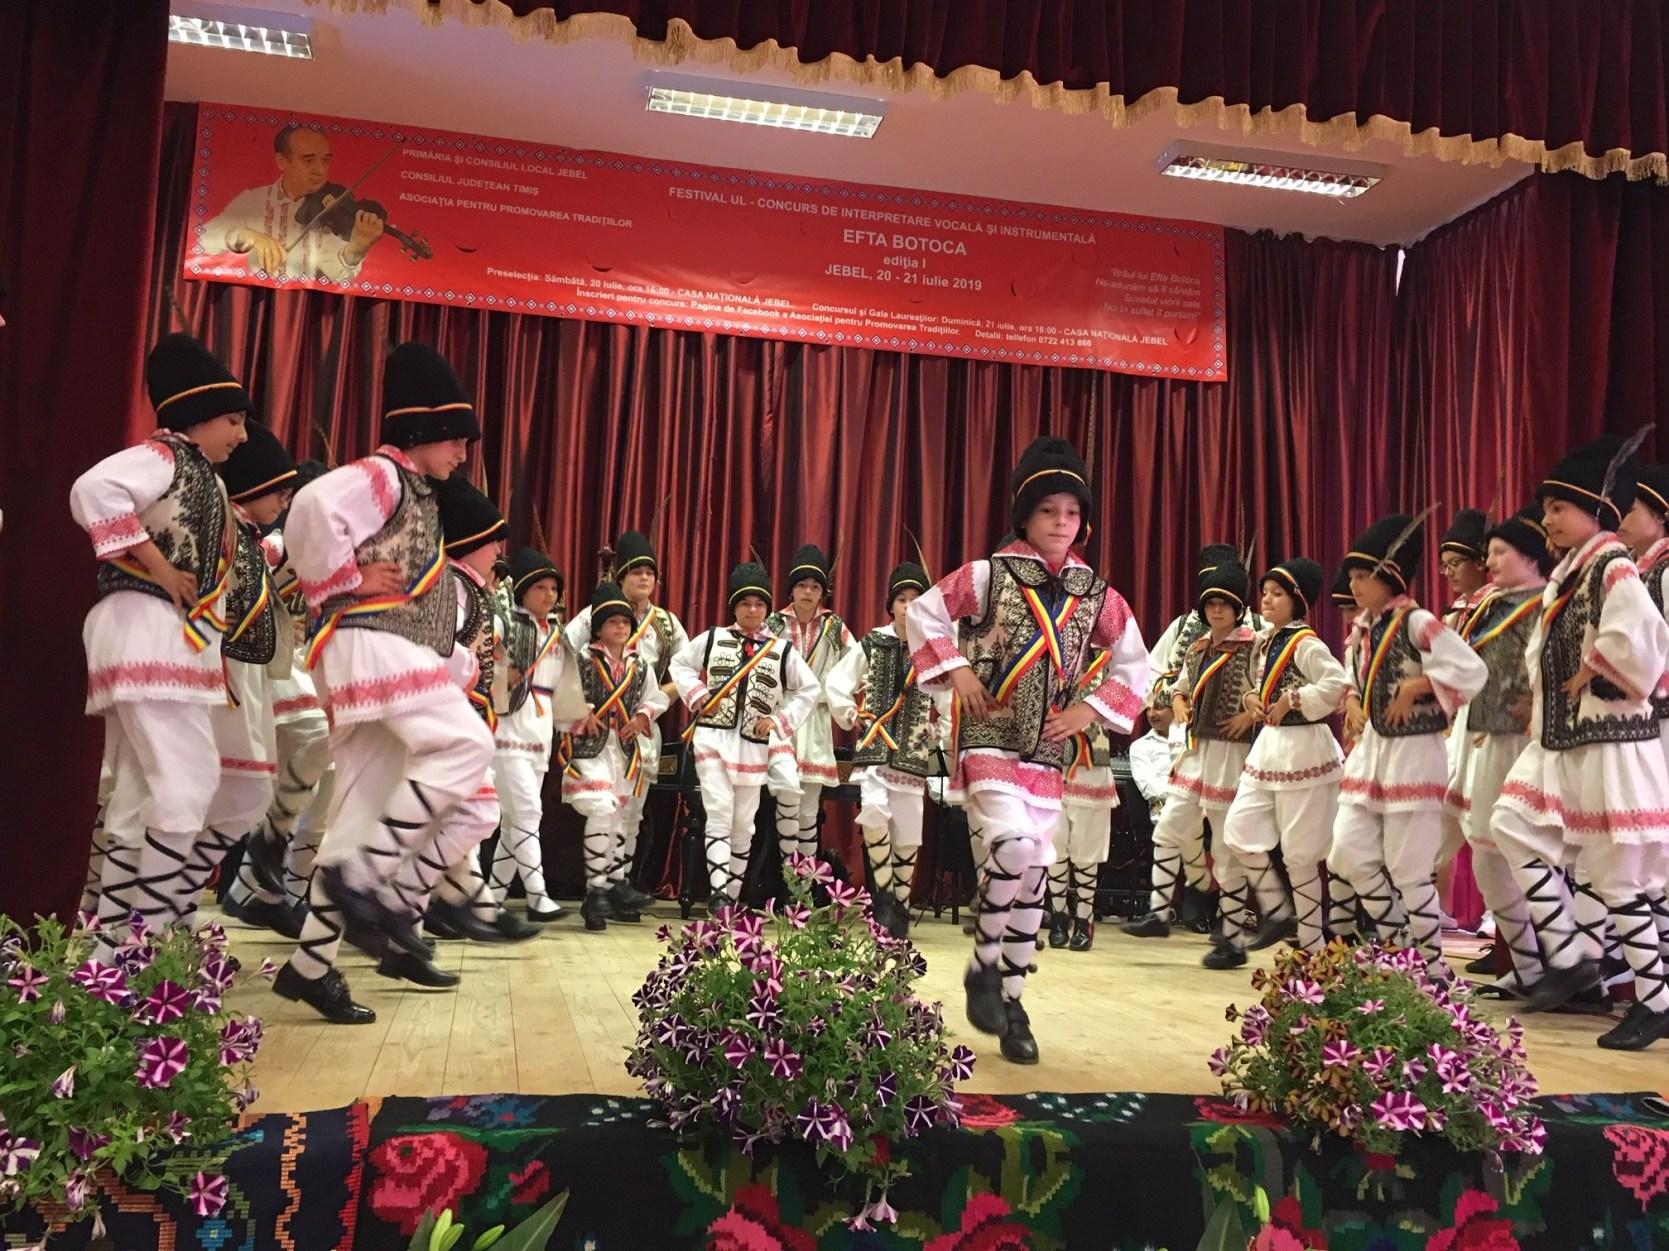 Festivalul-concurs Efta Boca